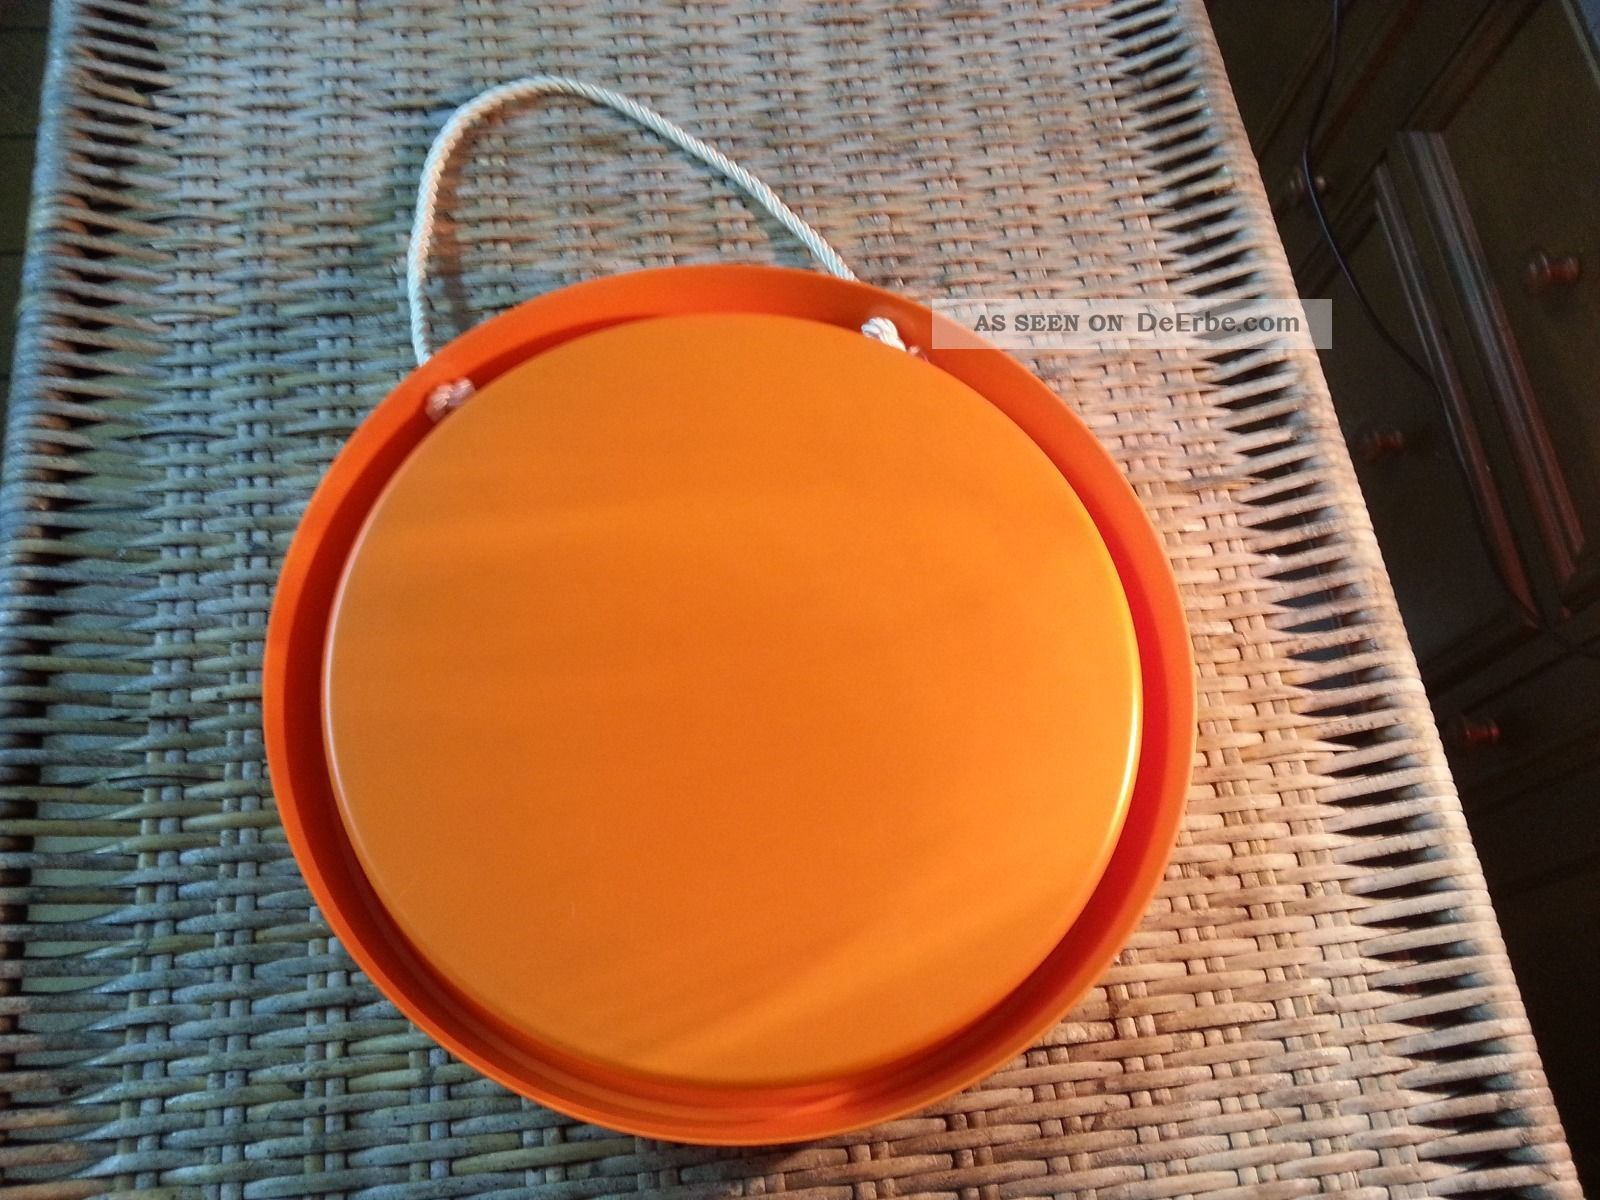 spiegel zum h ngen orange 70s 70er rund ddr retro kult. Black Bedroom Furniture Sets. Home Design Ideas